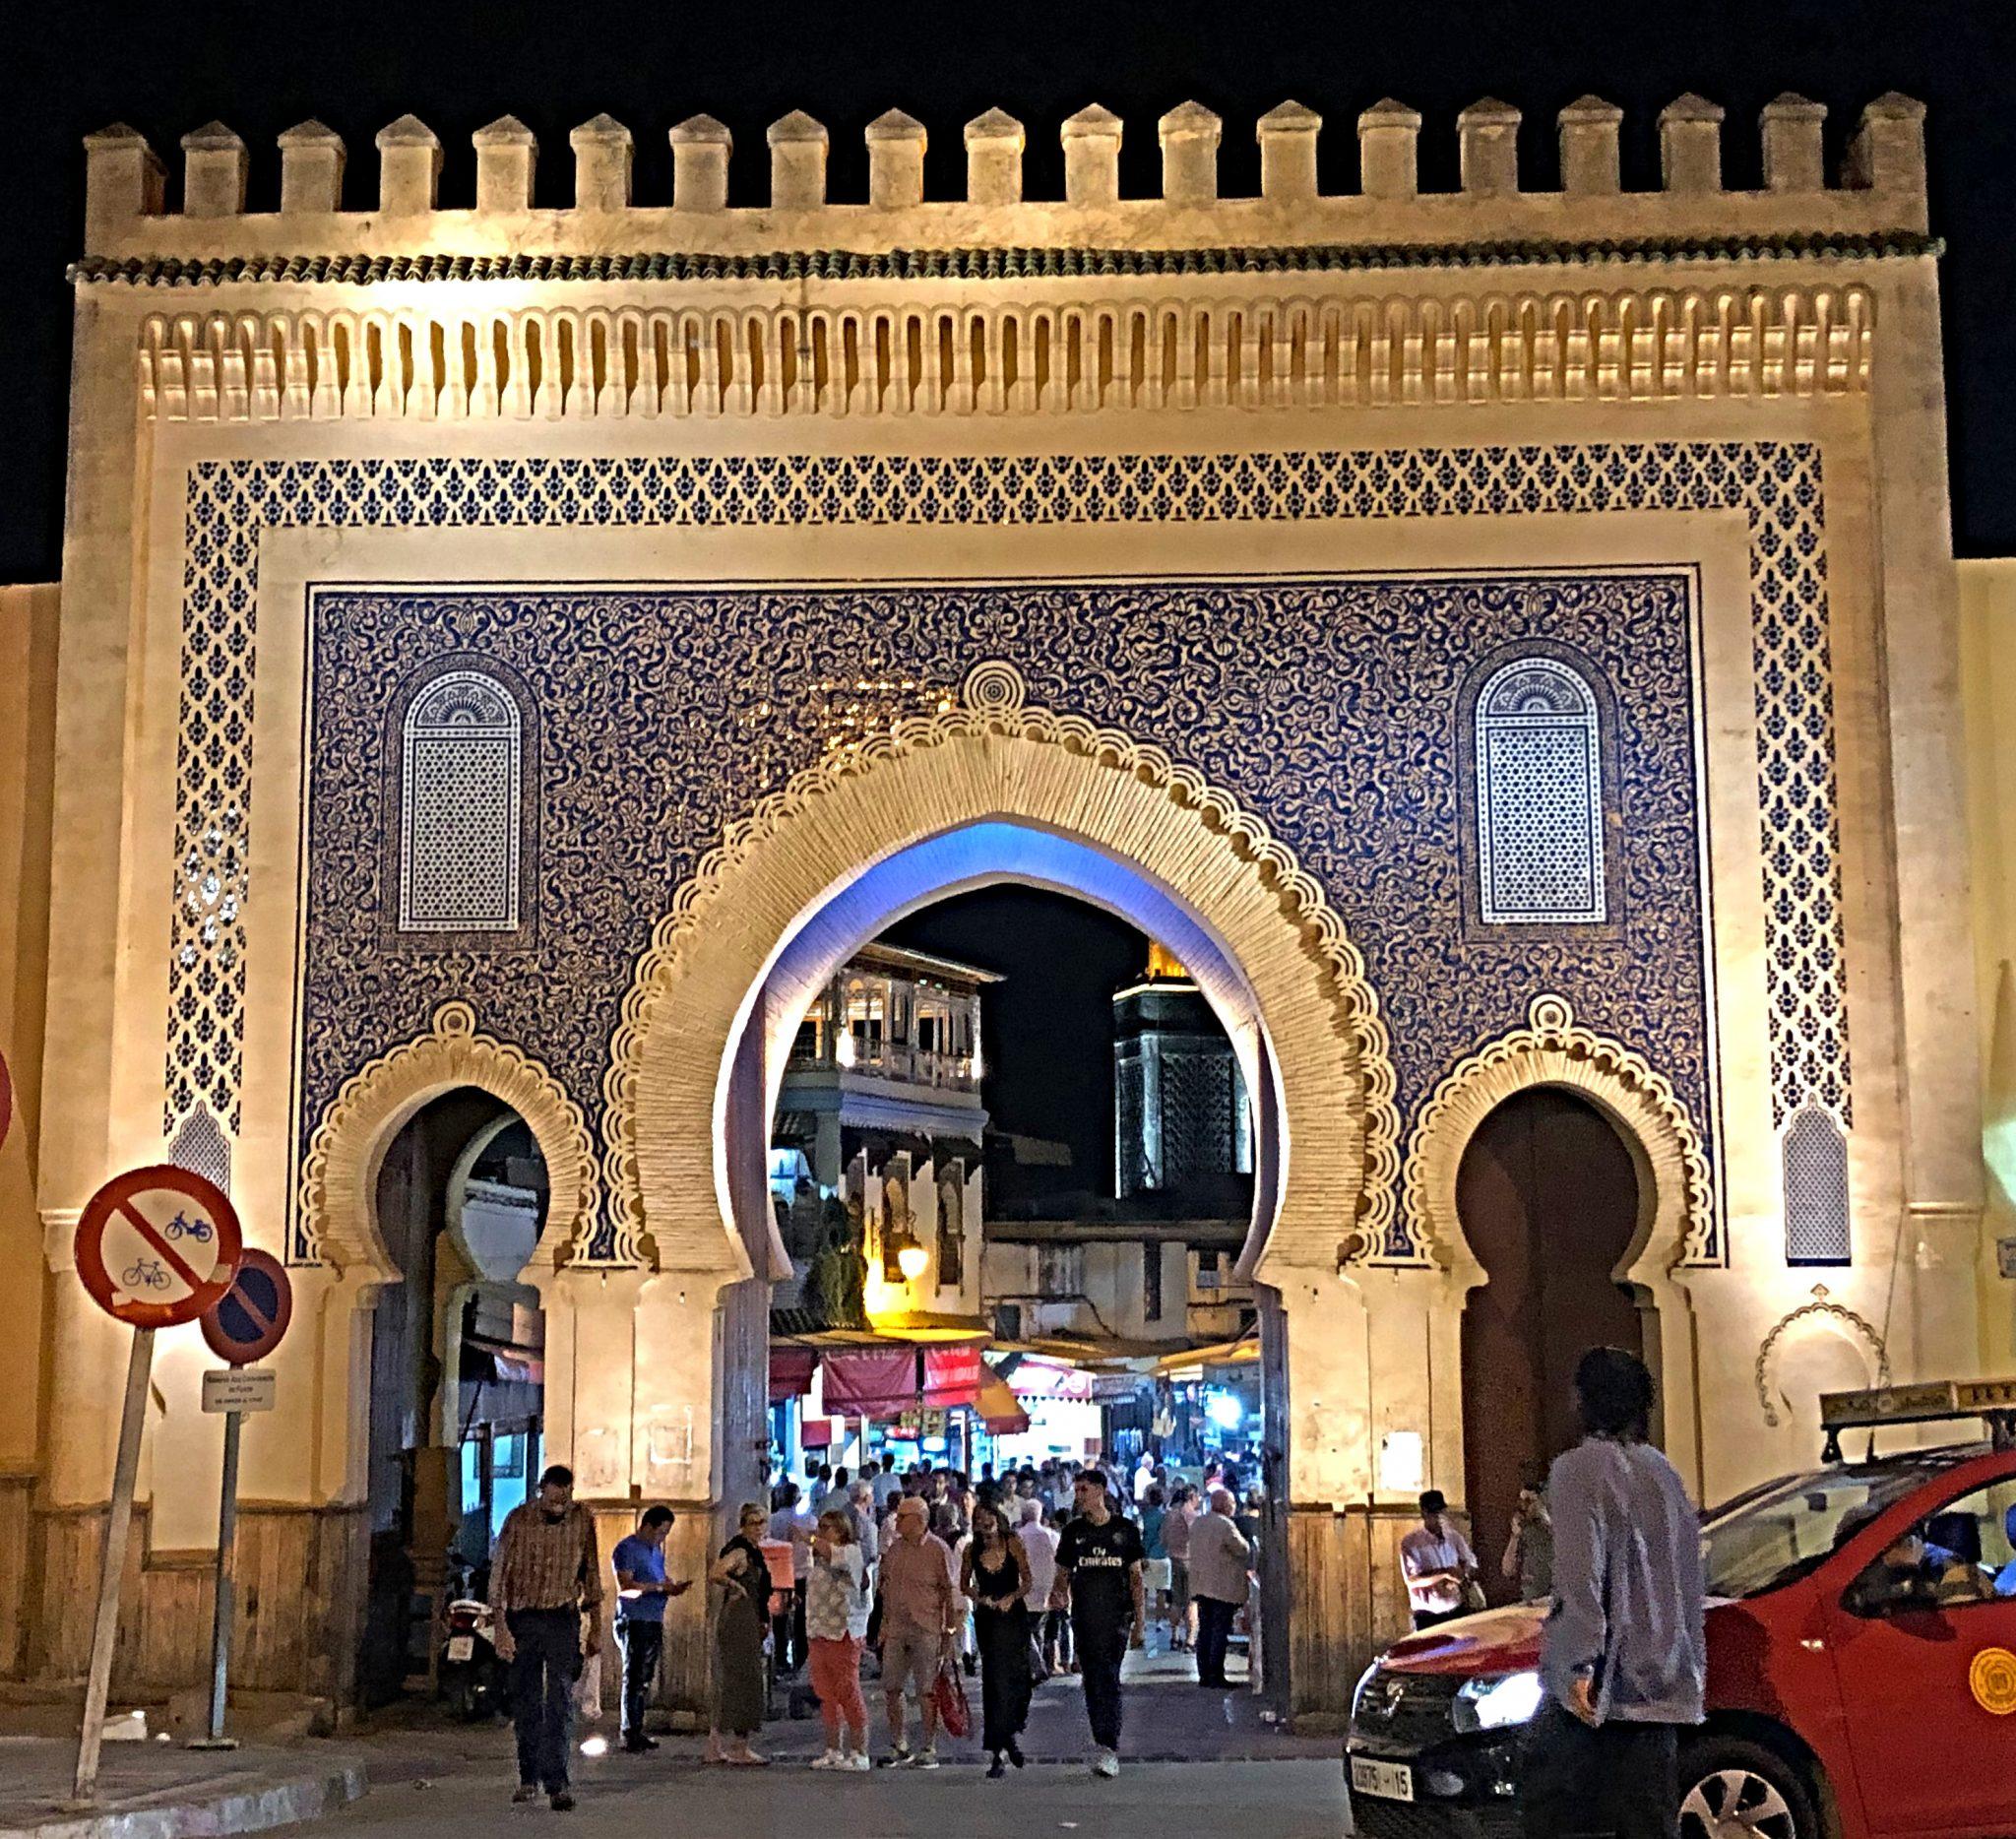 Img post Tres días en Fez. Puerta Azul Bab Bou Jeloud - PASAPORTE Y MILLAS